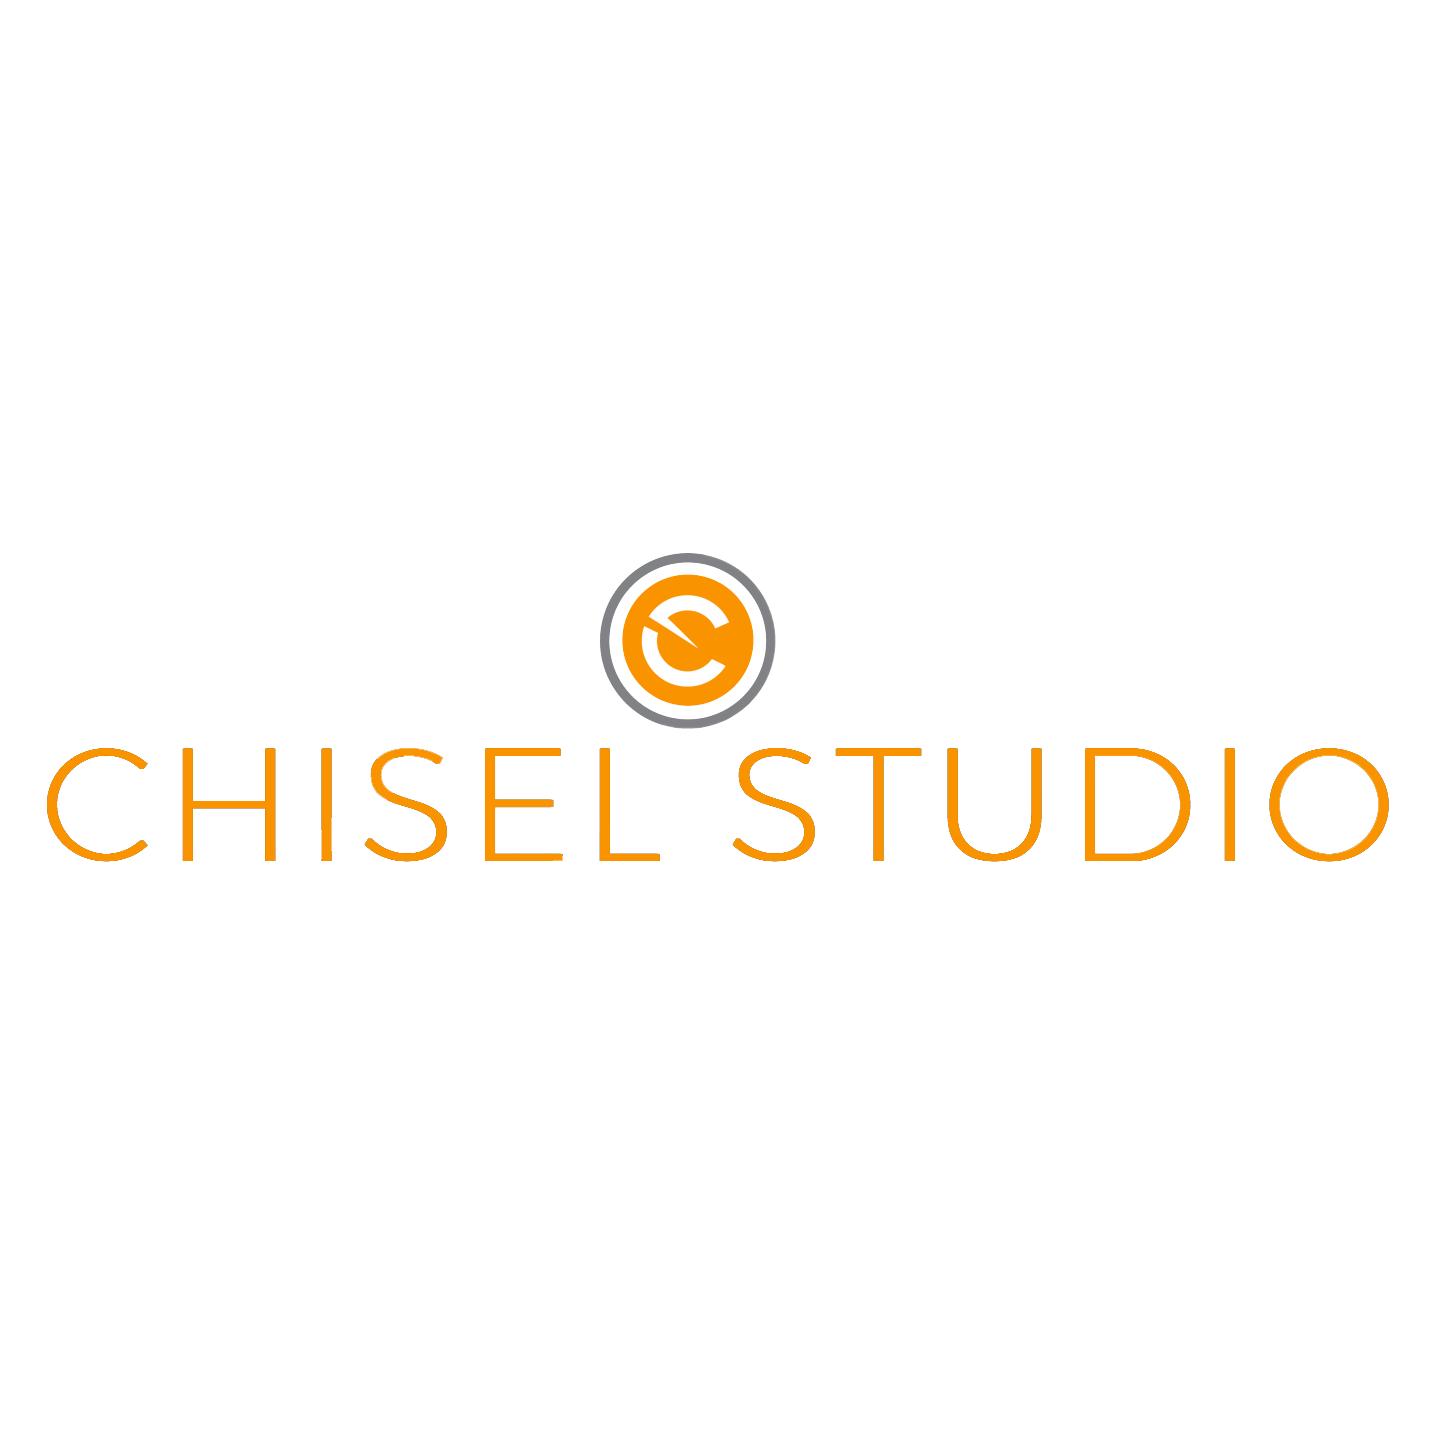 Chisel Studio